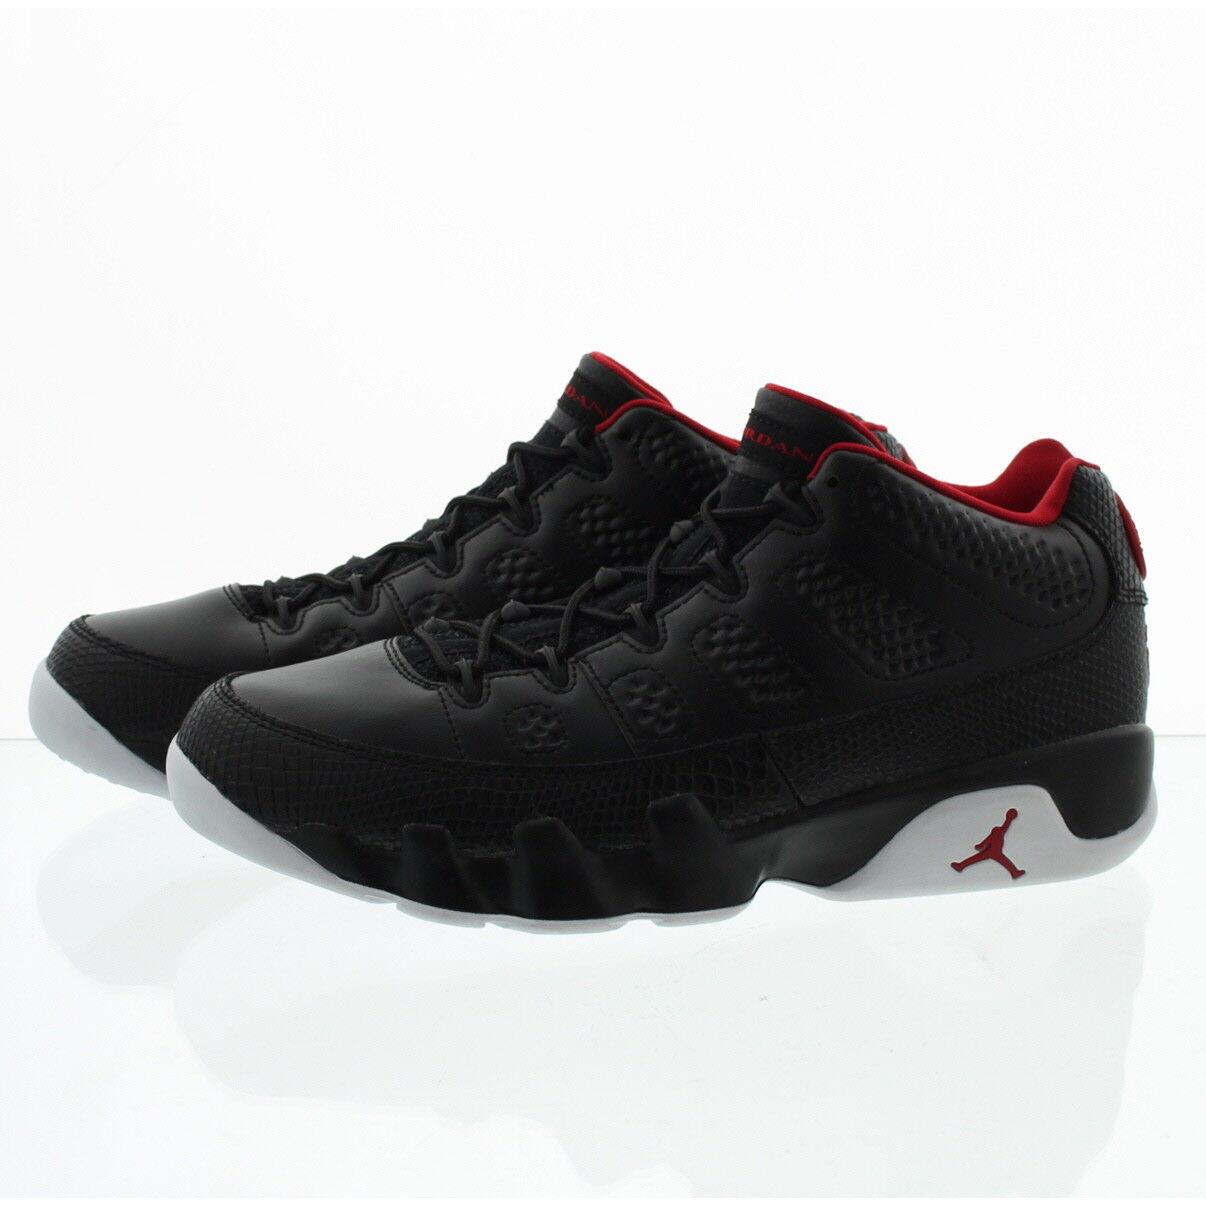 8589a143356ac6 ... Nike 832822 Mens Air Air Air Jordan Retro Low Top Basketball Athletic Shoes  Sneakers eaa819 ...